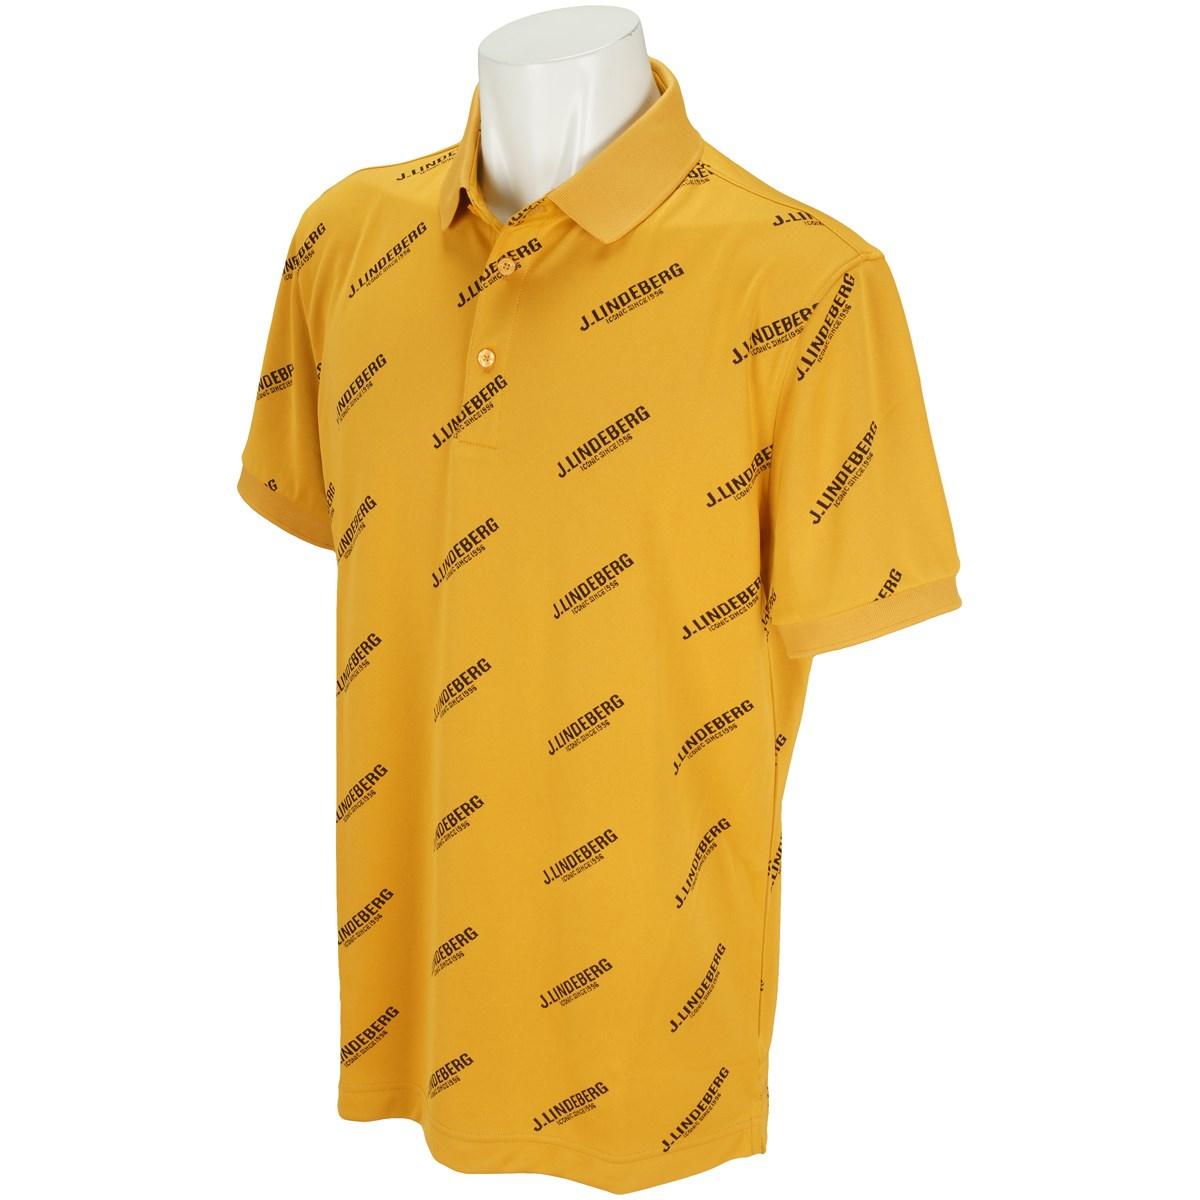 J.リンドバーグ 限定モデル Allover printed logos on M TOUR TECH SLIM TX JERSEY ストレッチ半袖ポロシャツ